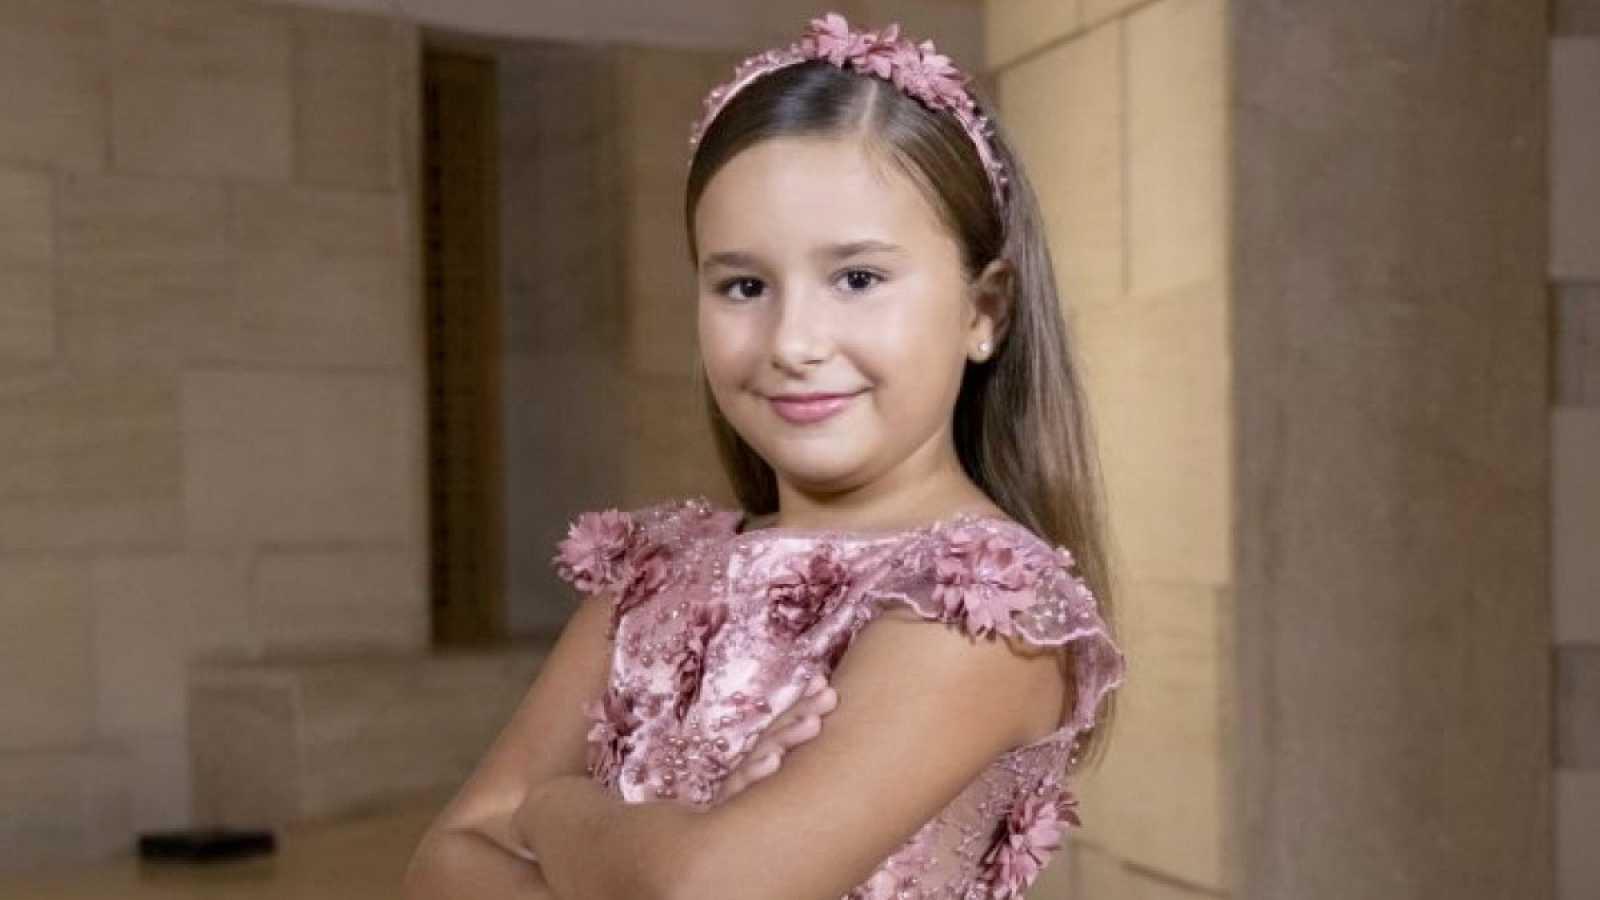 Chanel Monseigneur será la candidata de Malta en Eurovisión Junior 2020